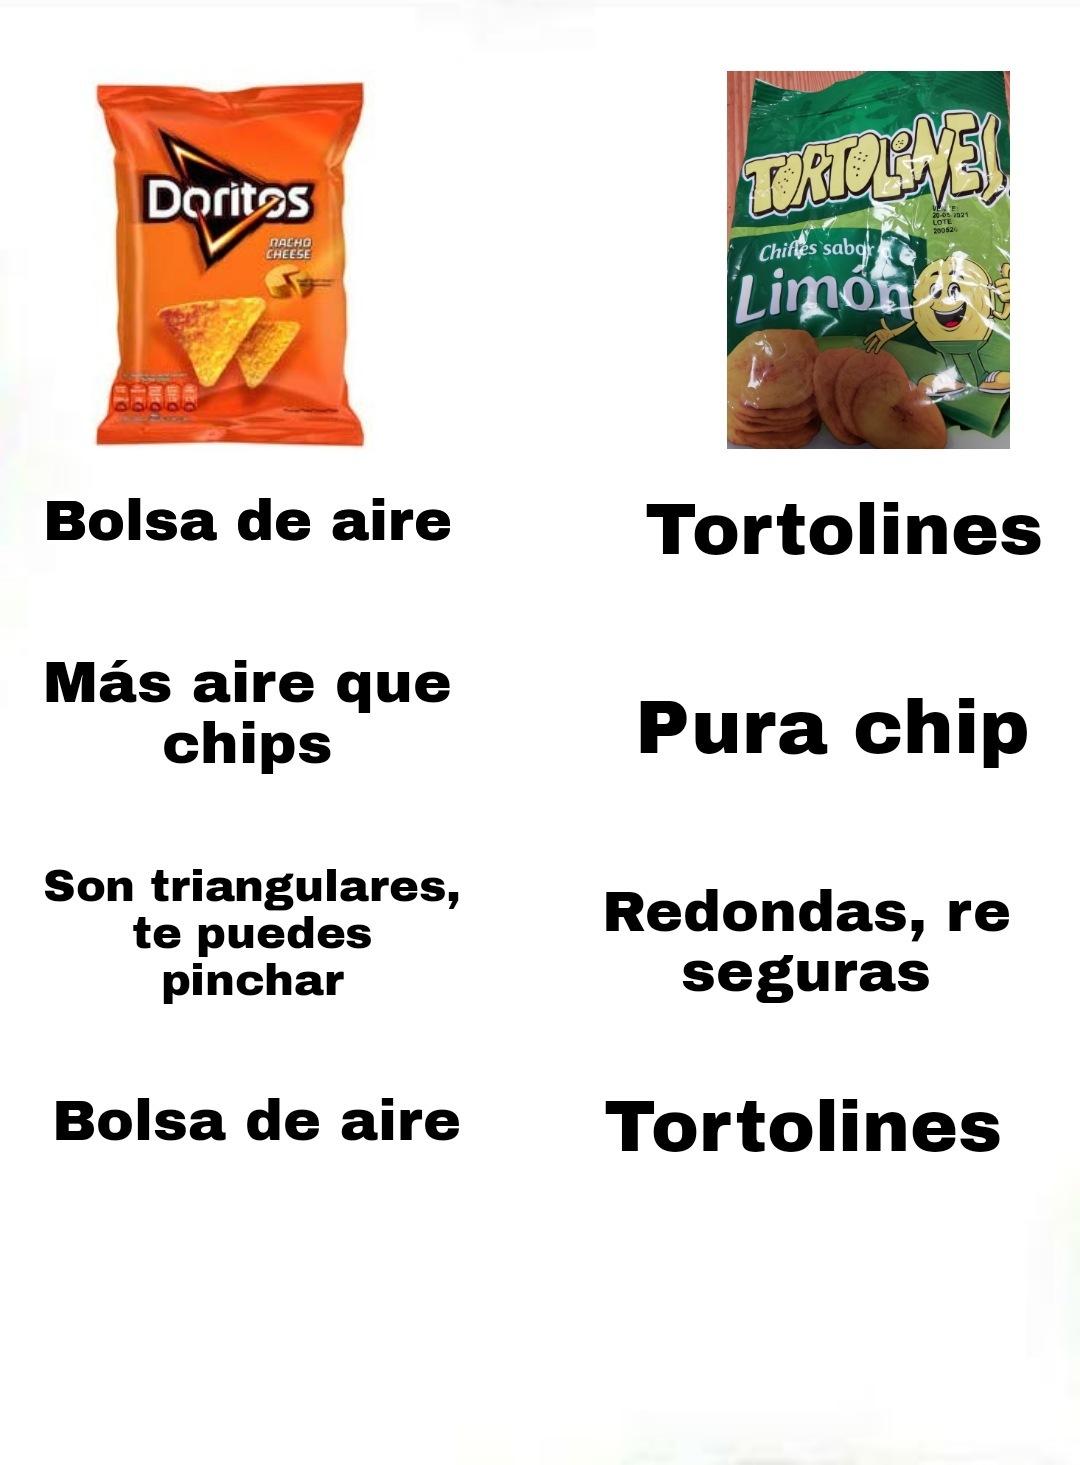 Joder q buenas las tortolines lpm - meme